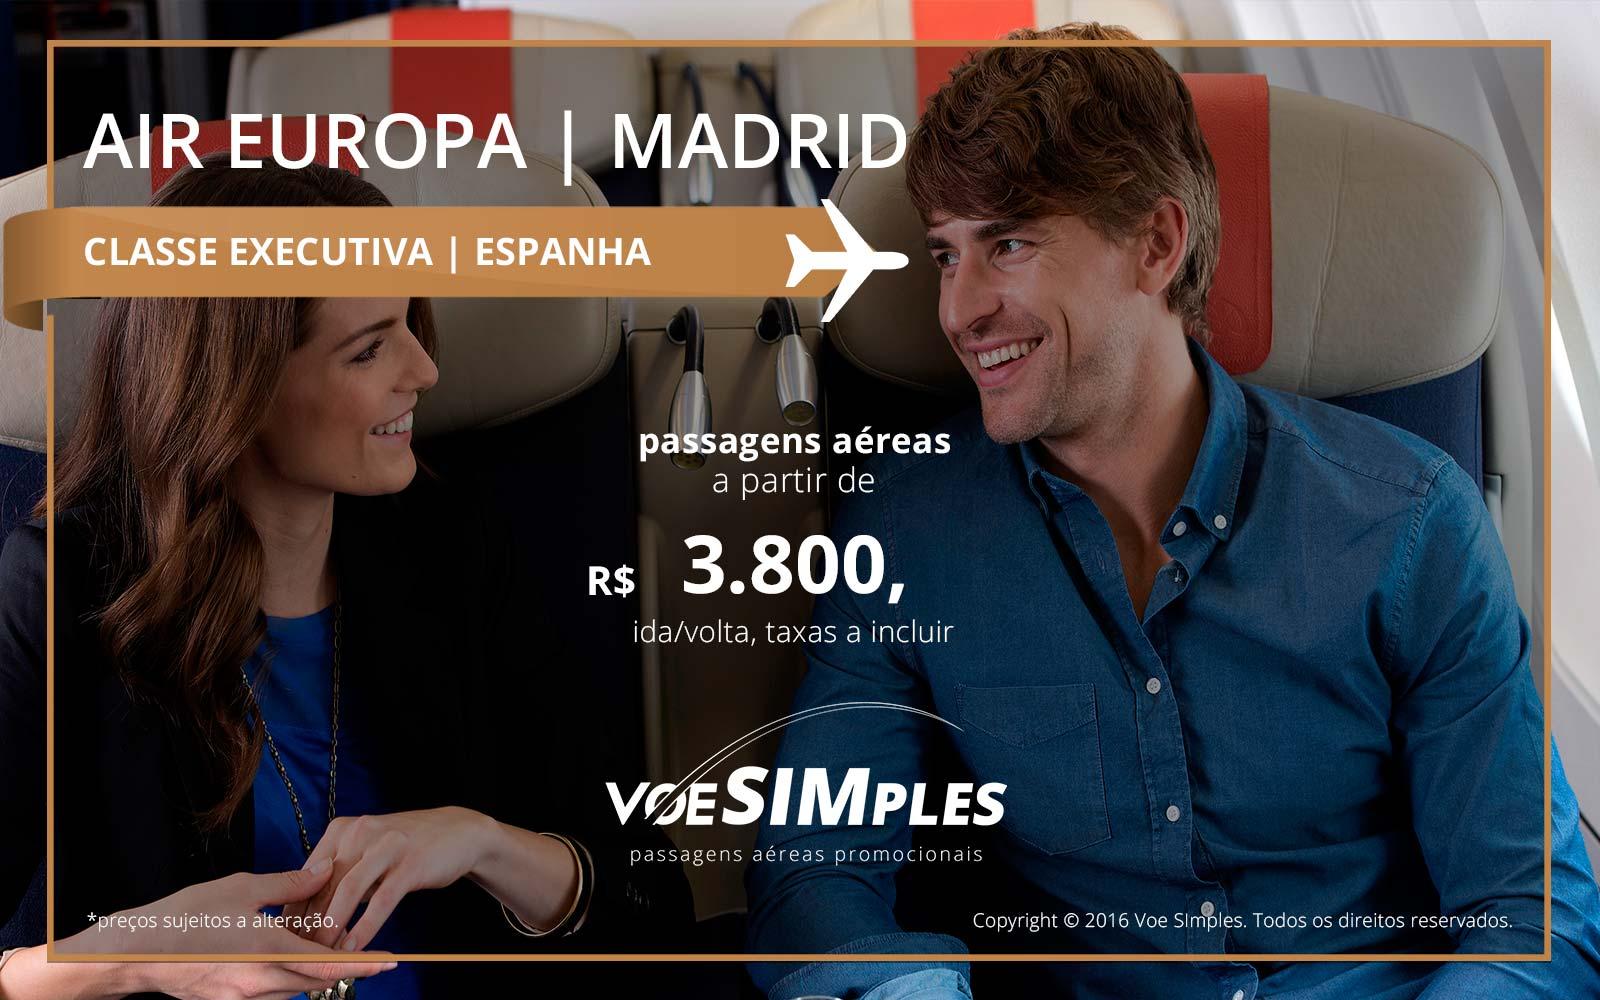 Passagem aérea Classe Executiva Air Europa para Madri